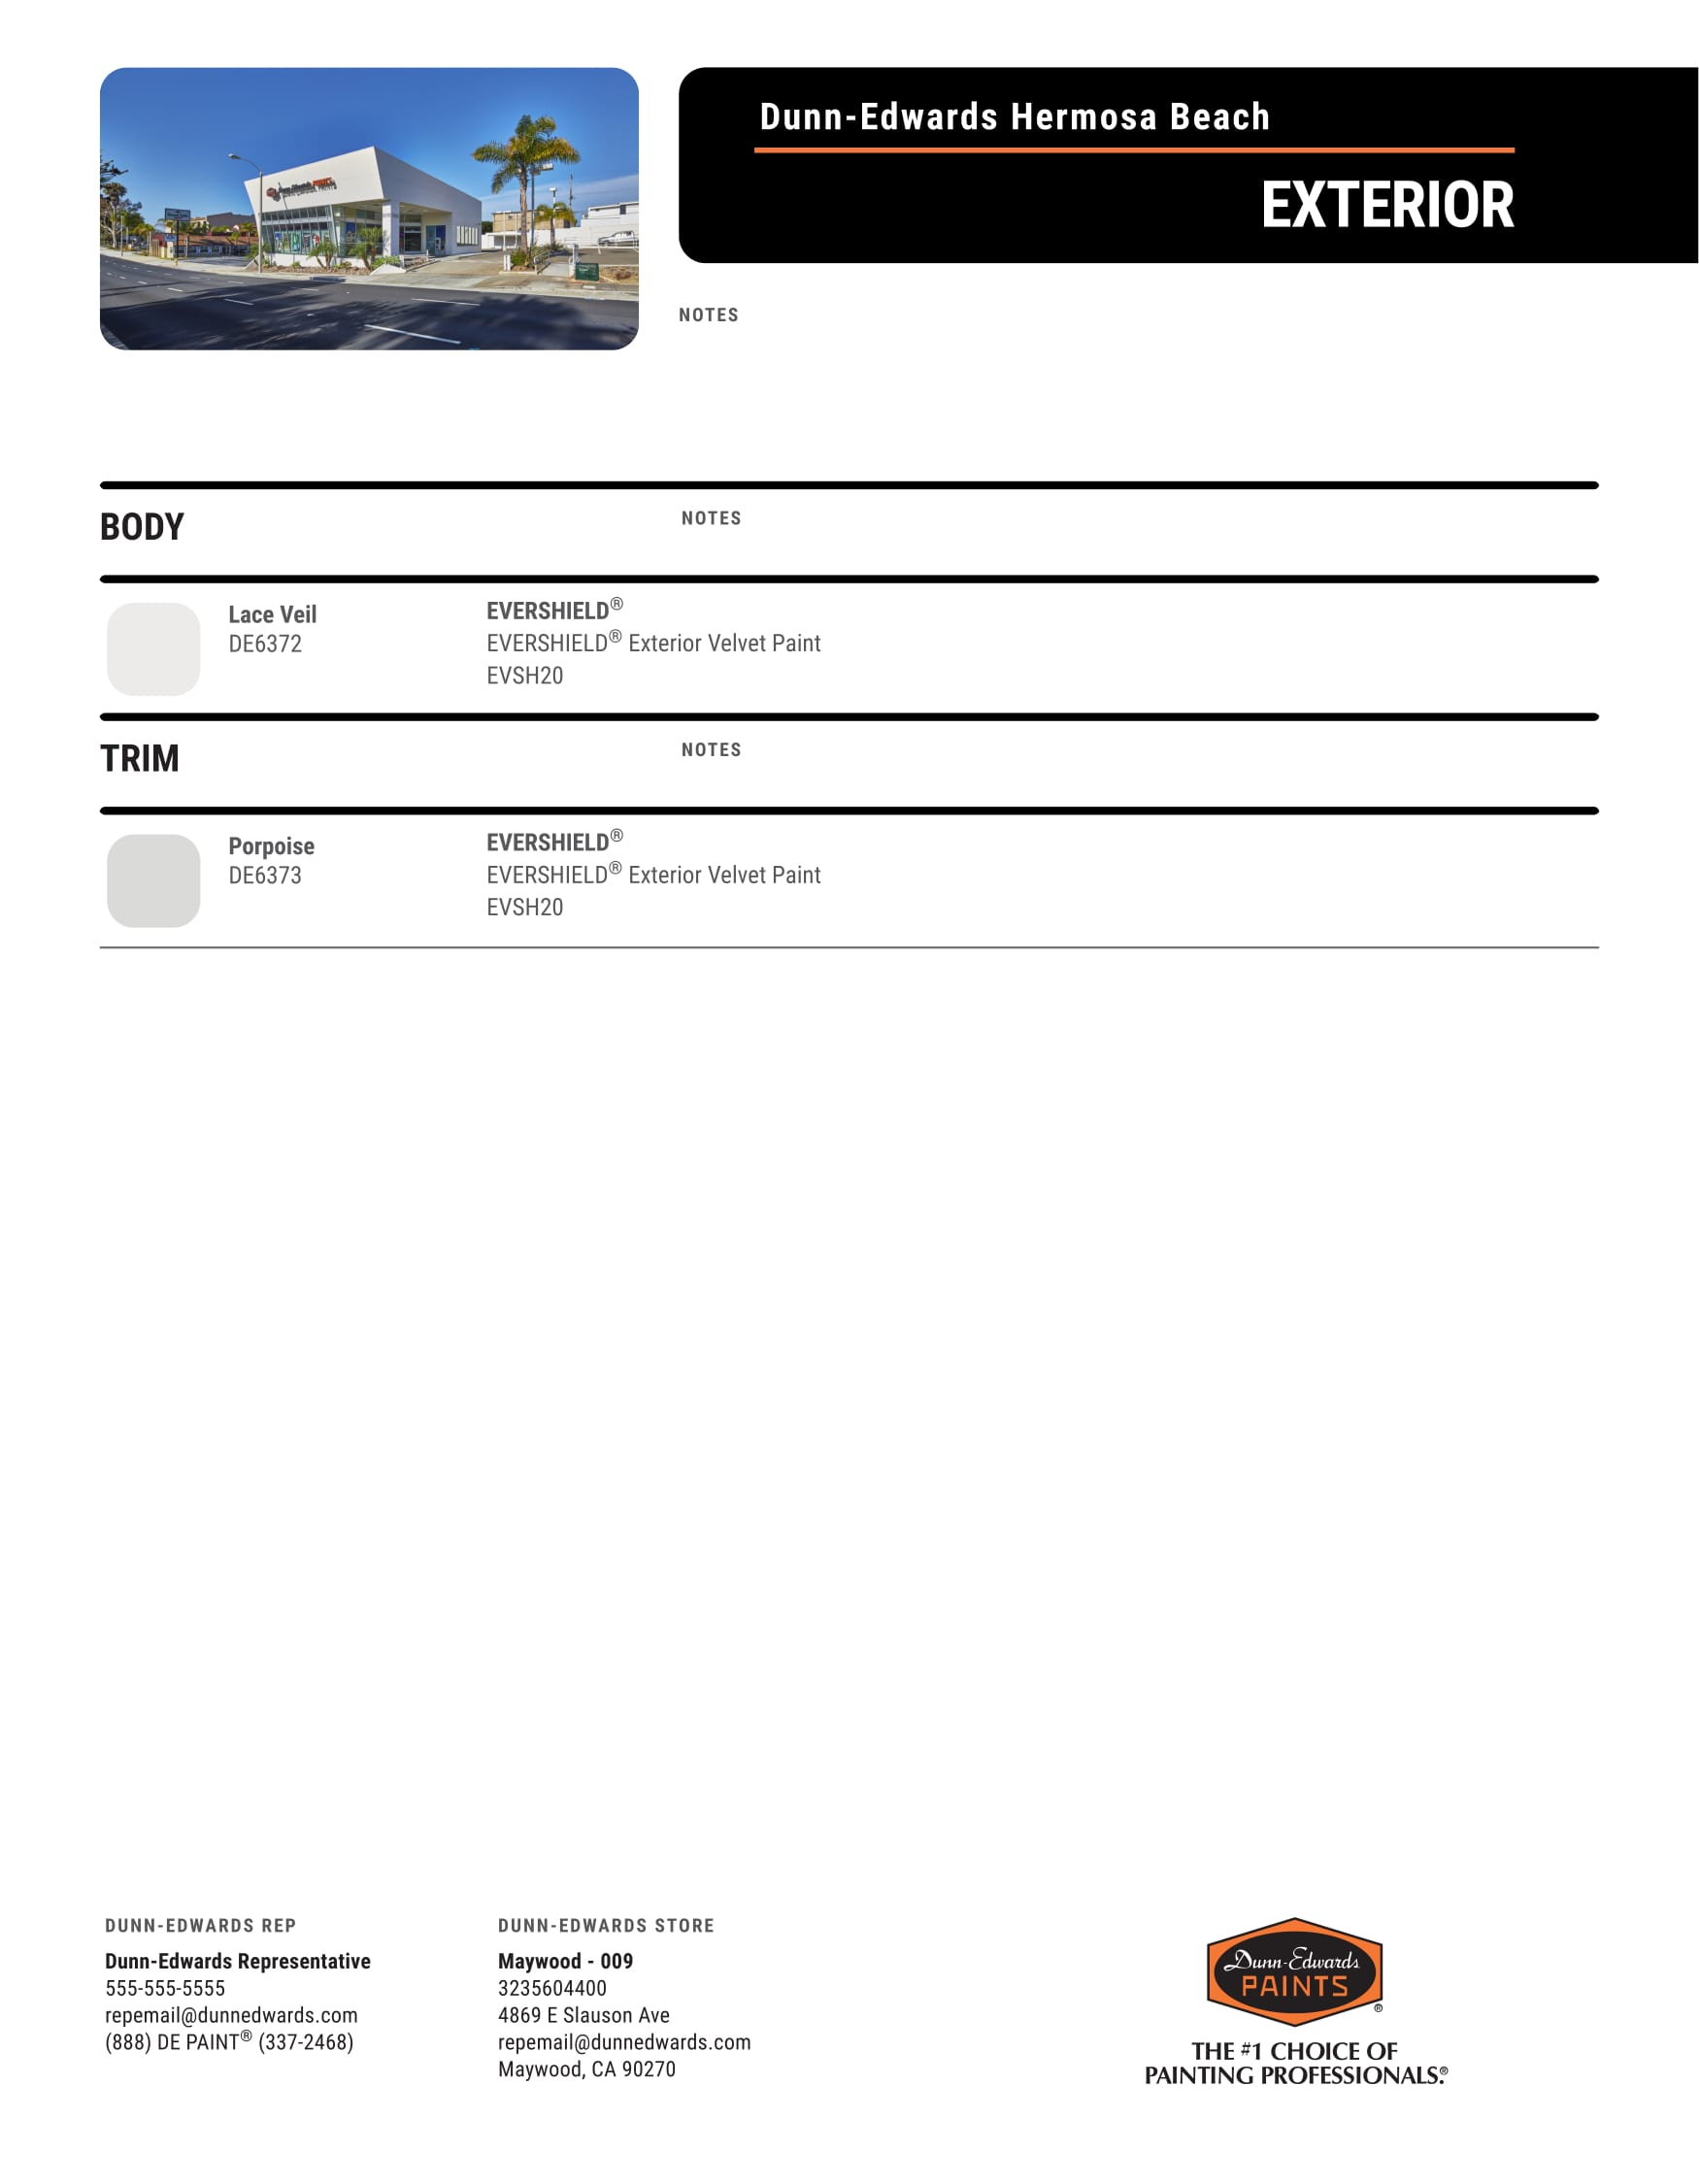 job record Dunn Edwards Hermosa Beach 2